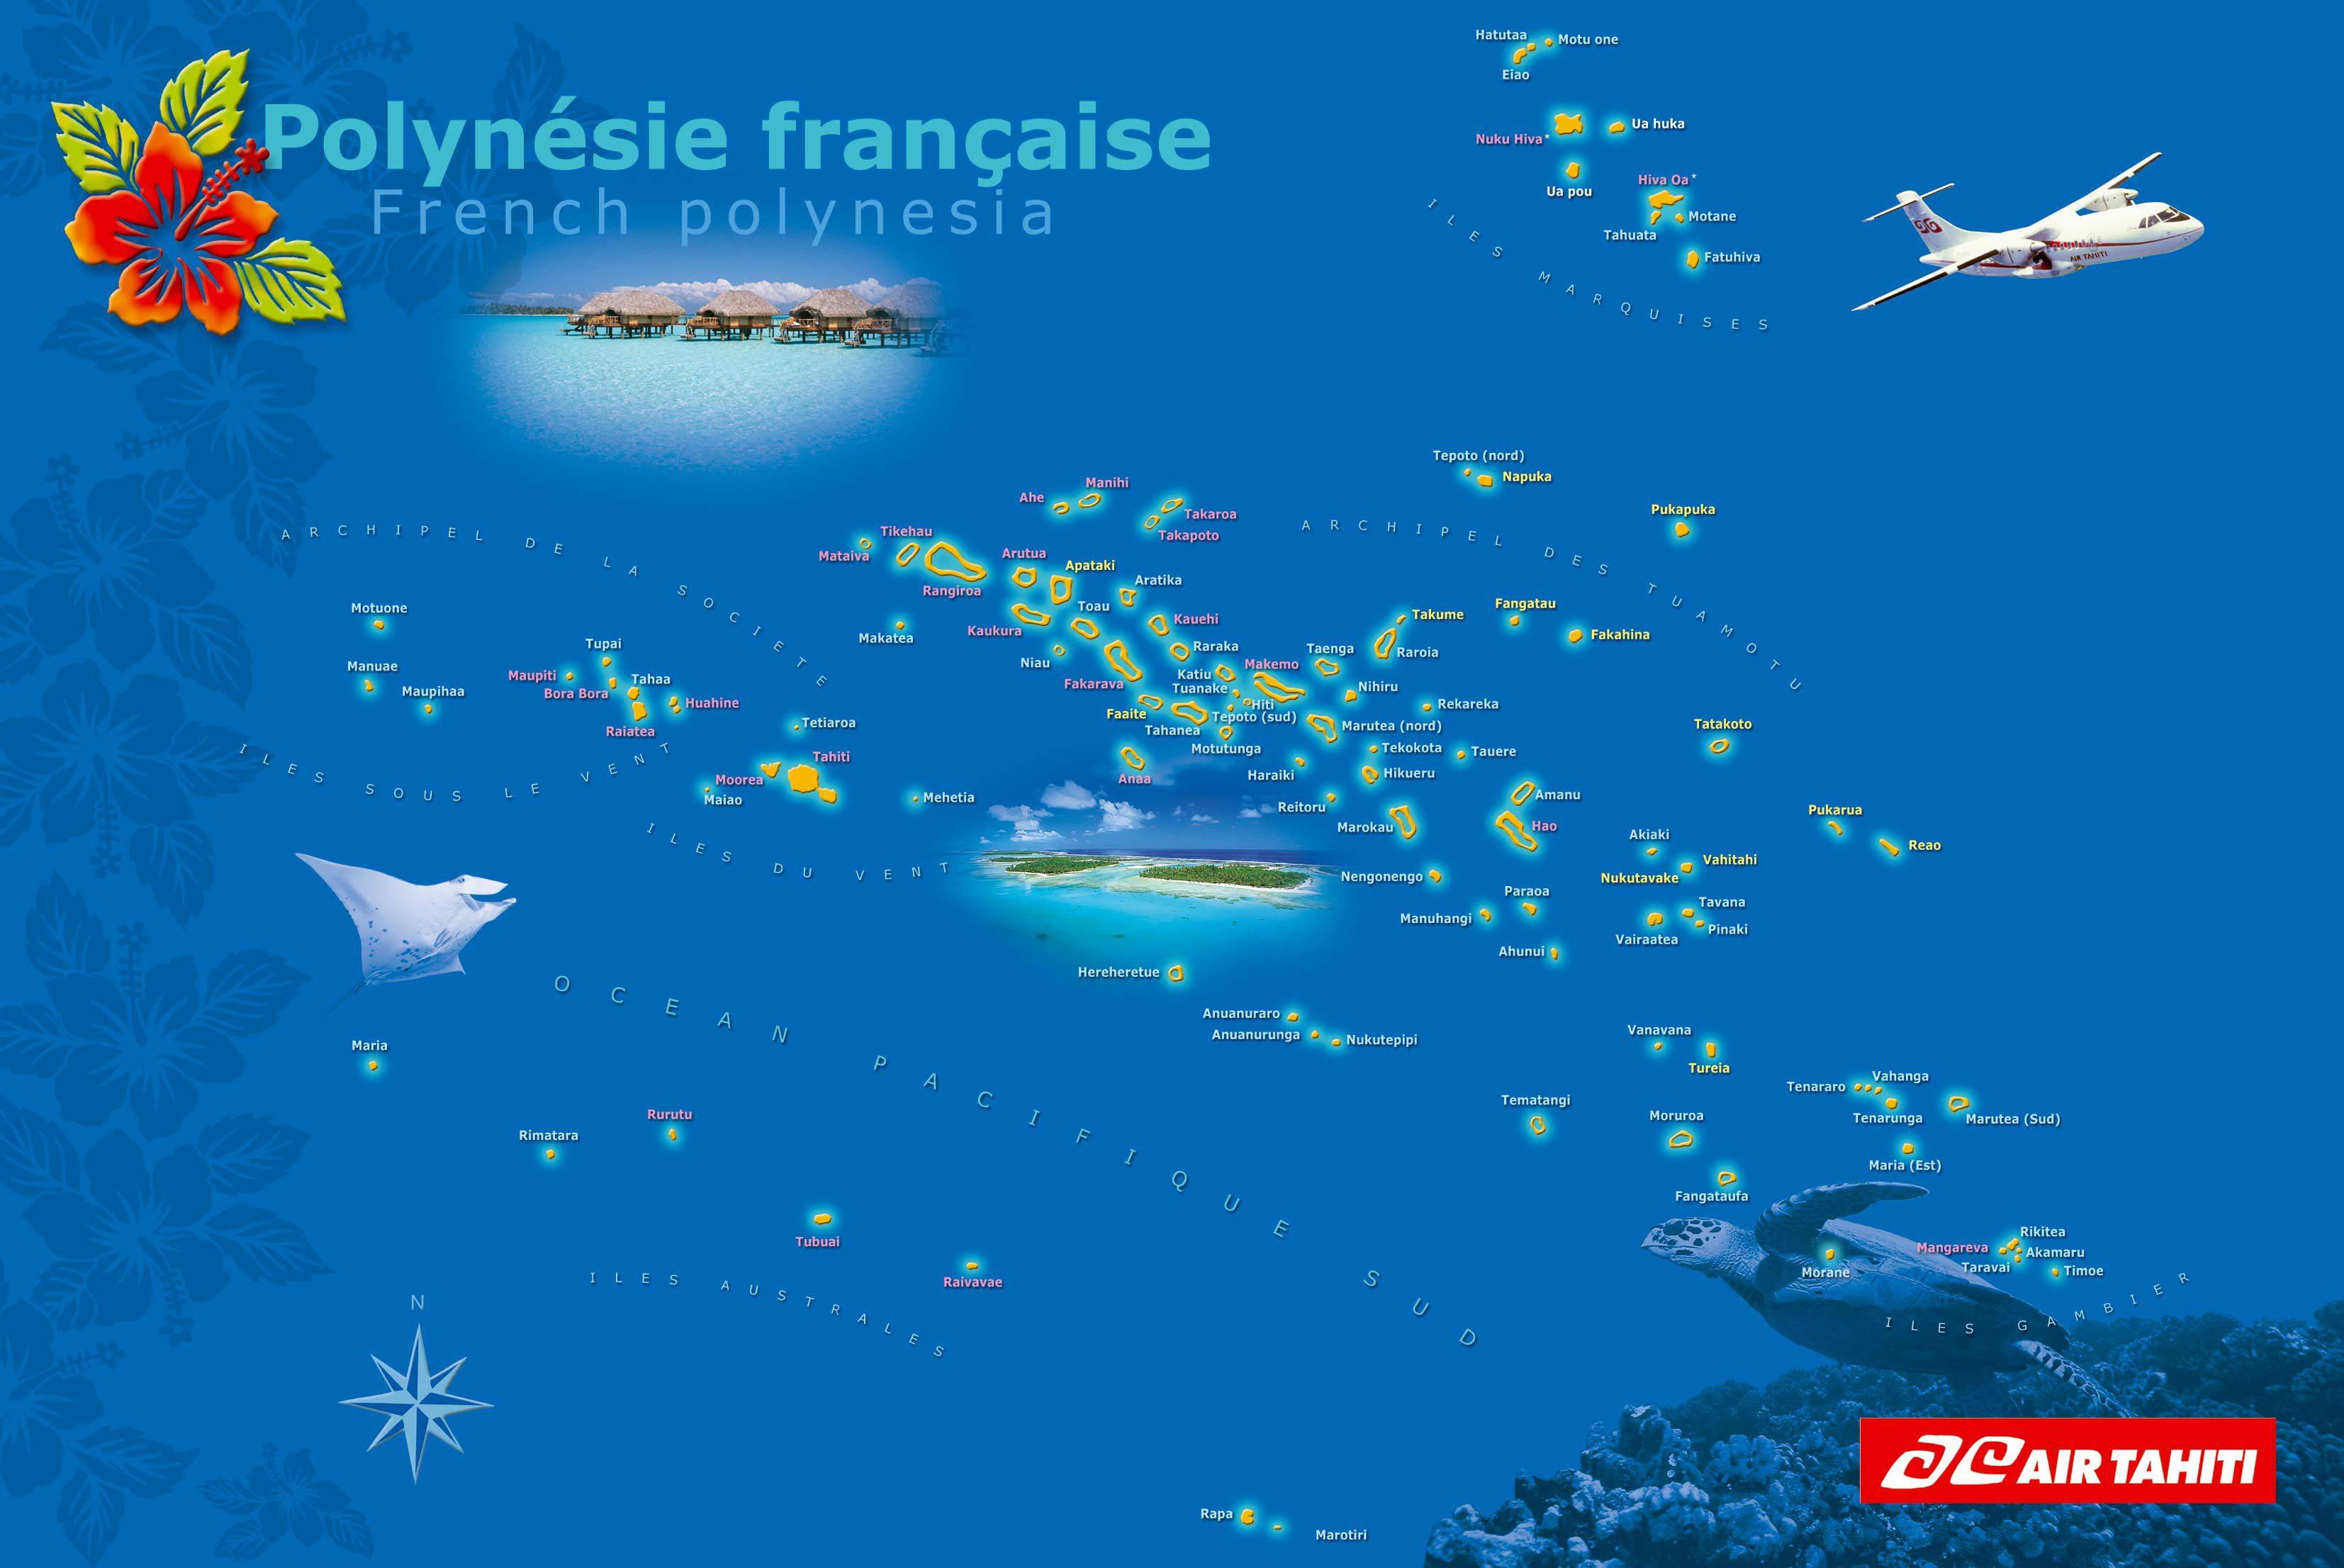 Air Tahiti Flight Map For French Polynesia South Pacific Travel - French polynesia map